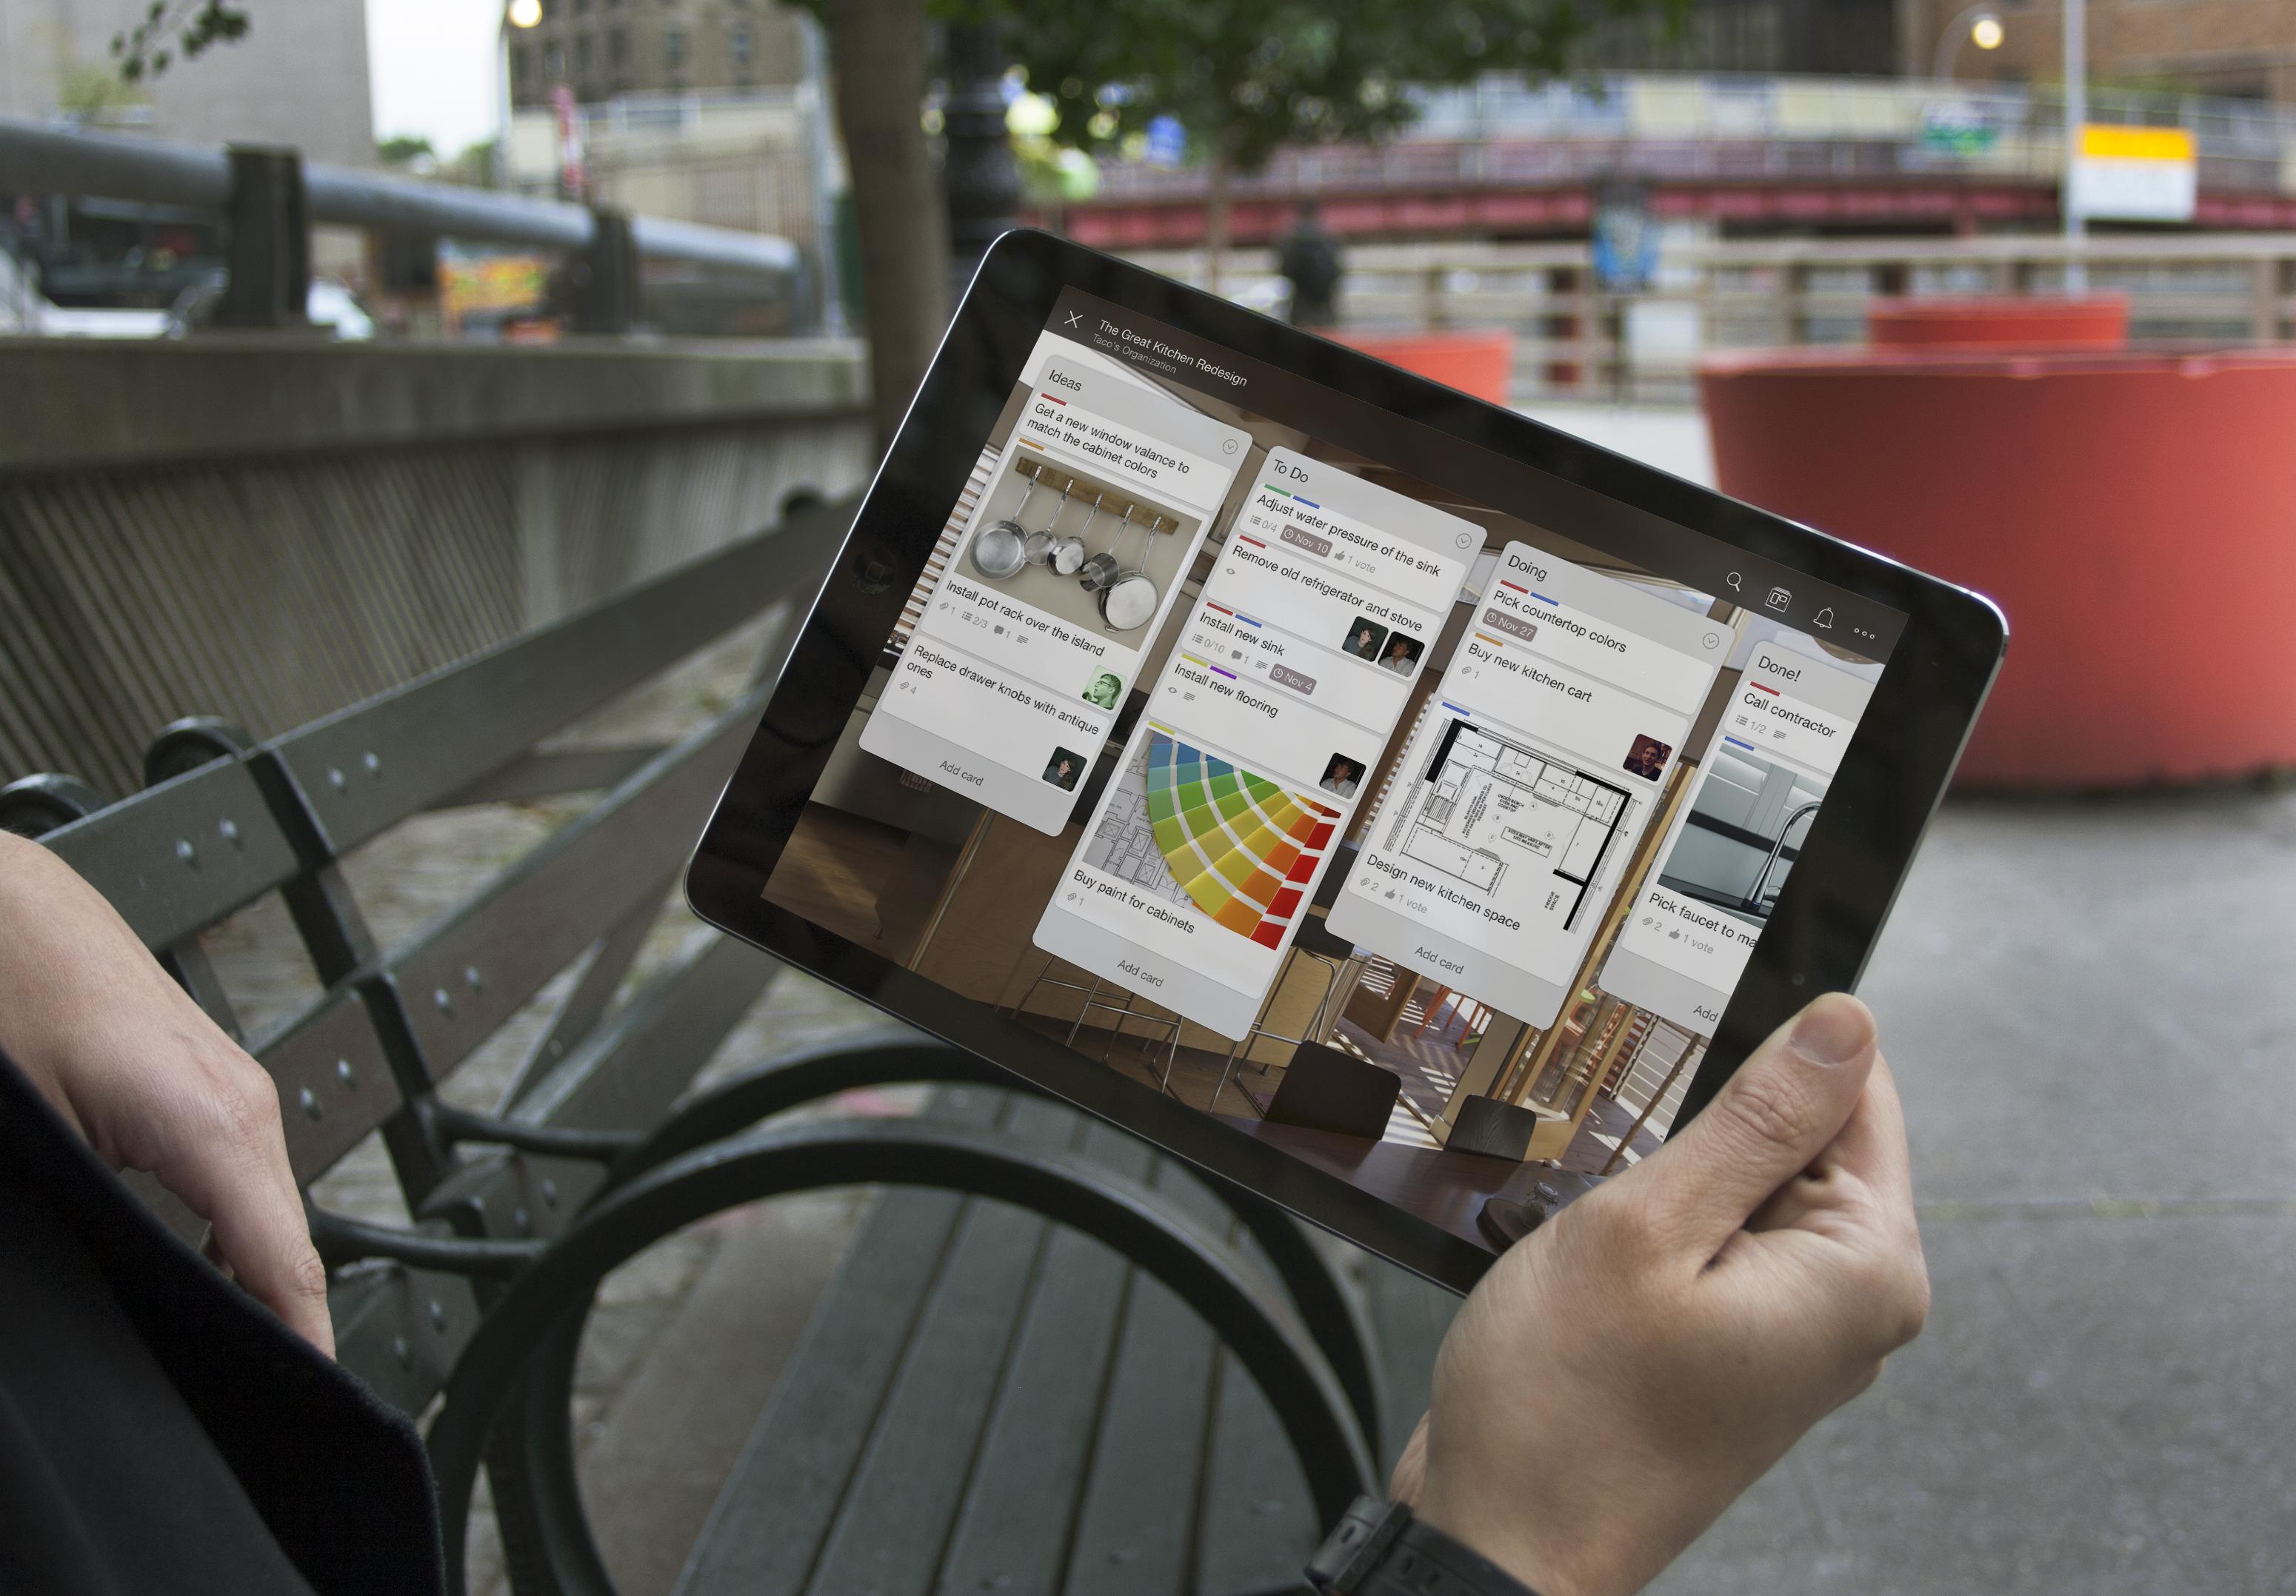 Trello-iOS-iPad-Air